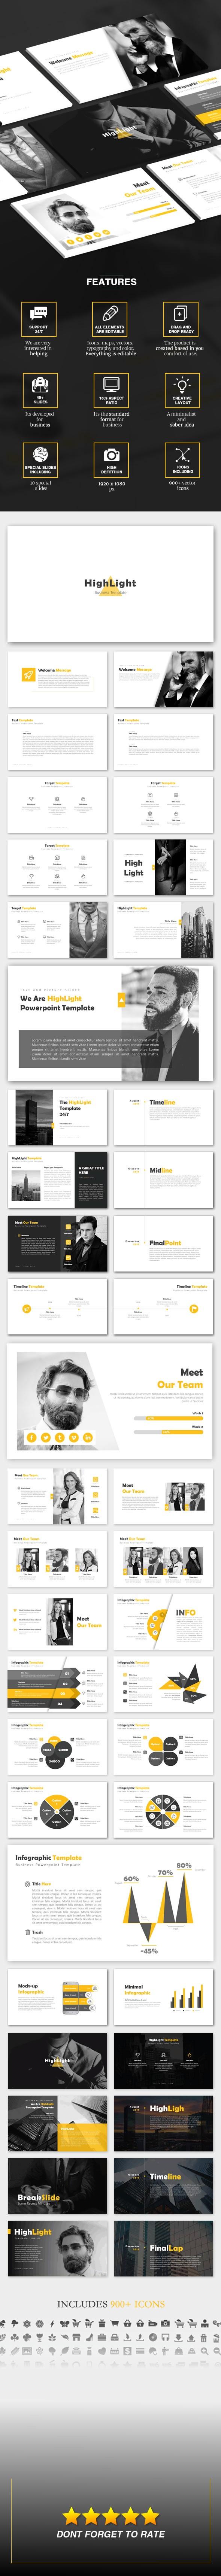 Highlight - Business Powerpoint Template